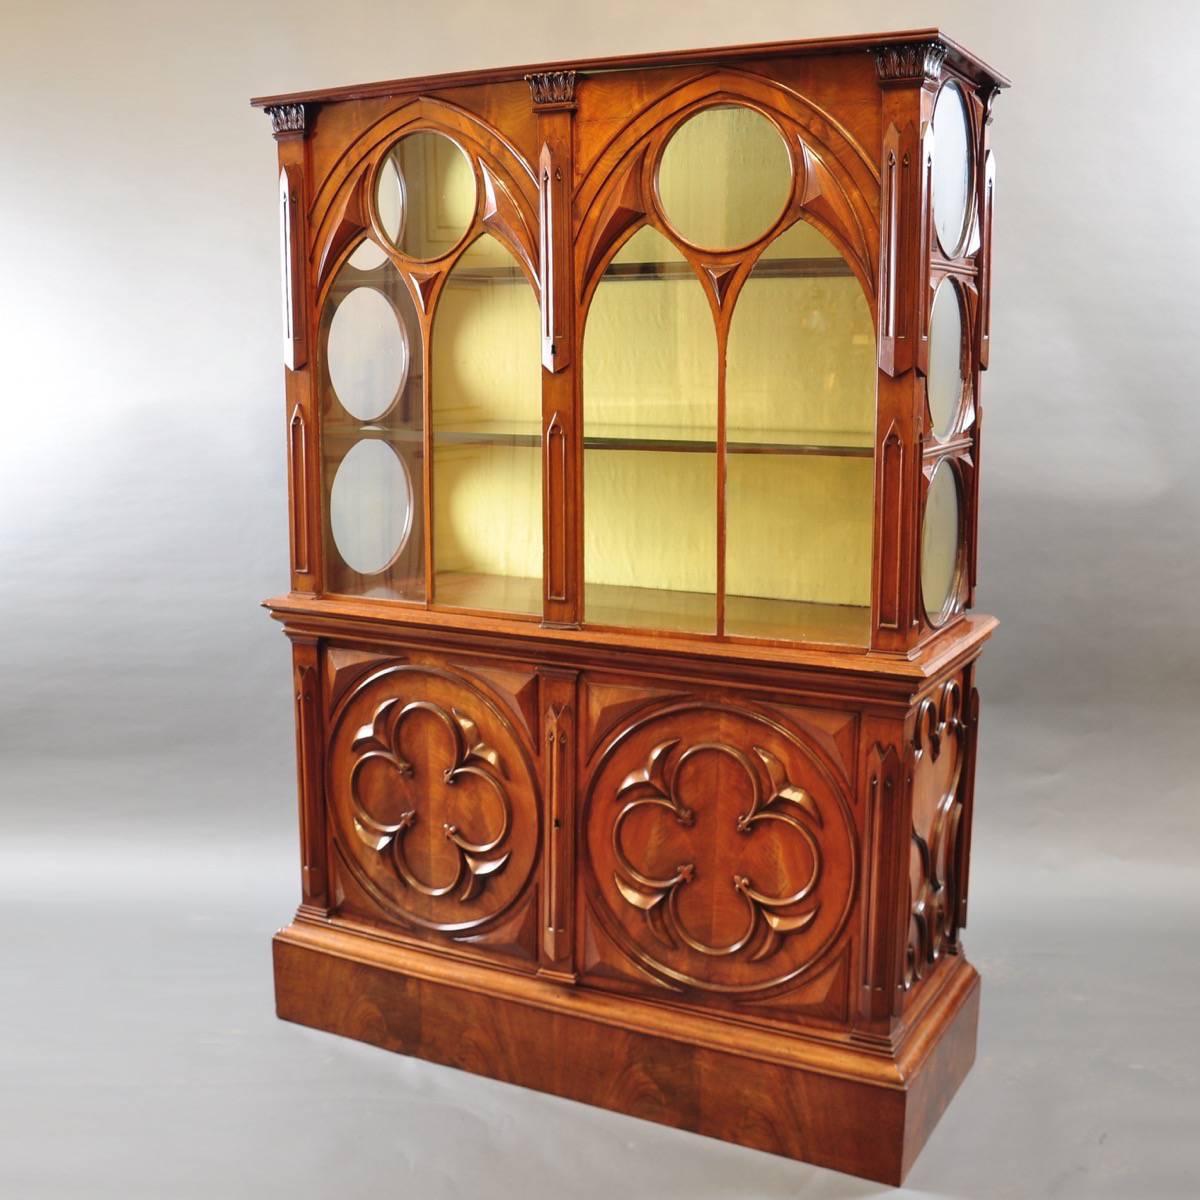 Gothic Style English Vitrine   De Grande Antique Furniture With Regard To Gothic Sofas (View 5 of 15)